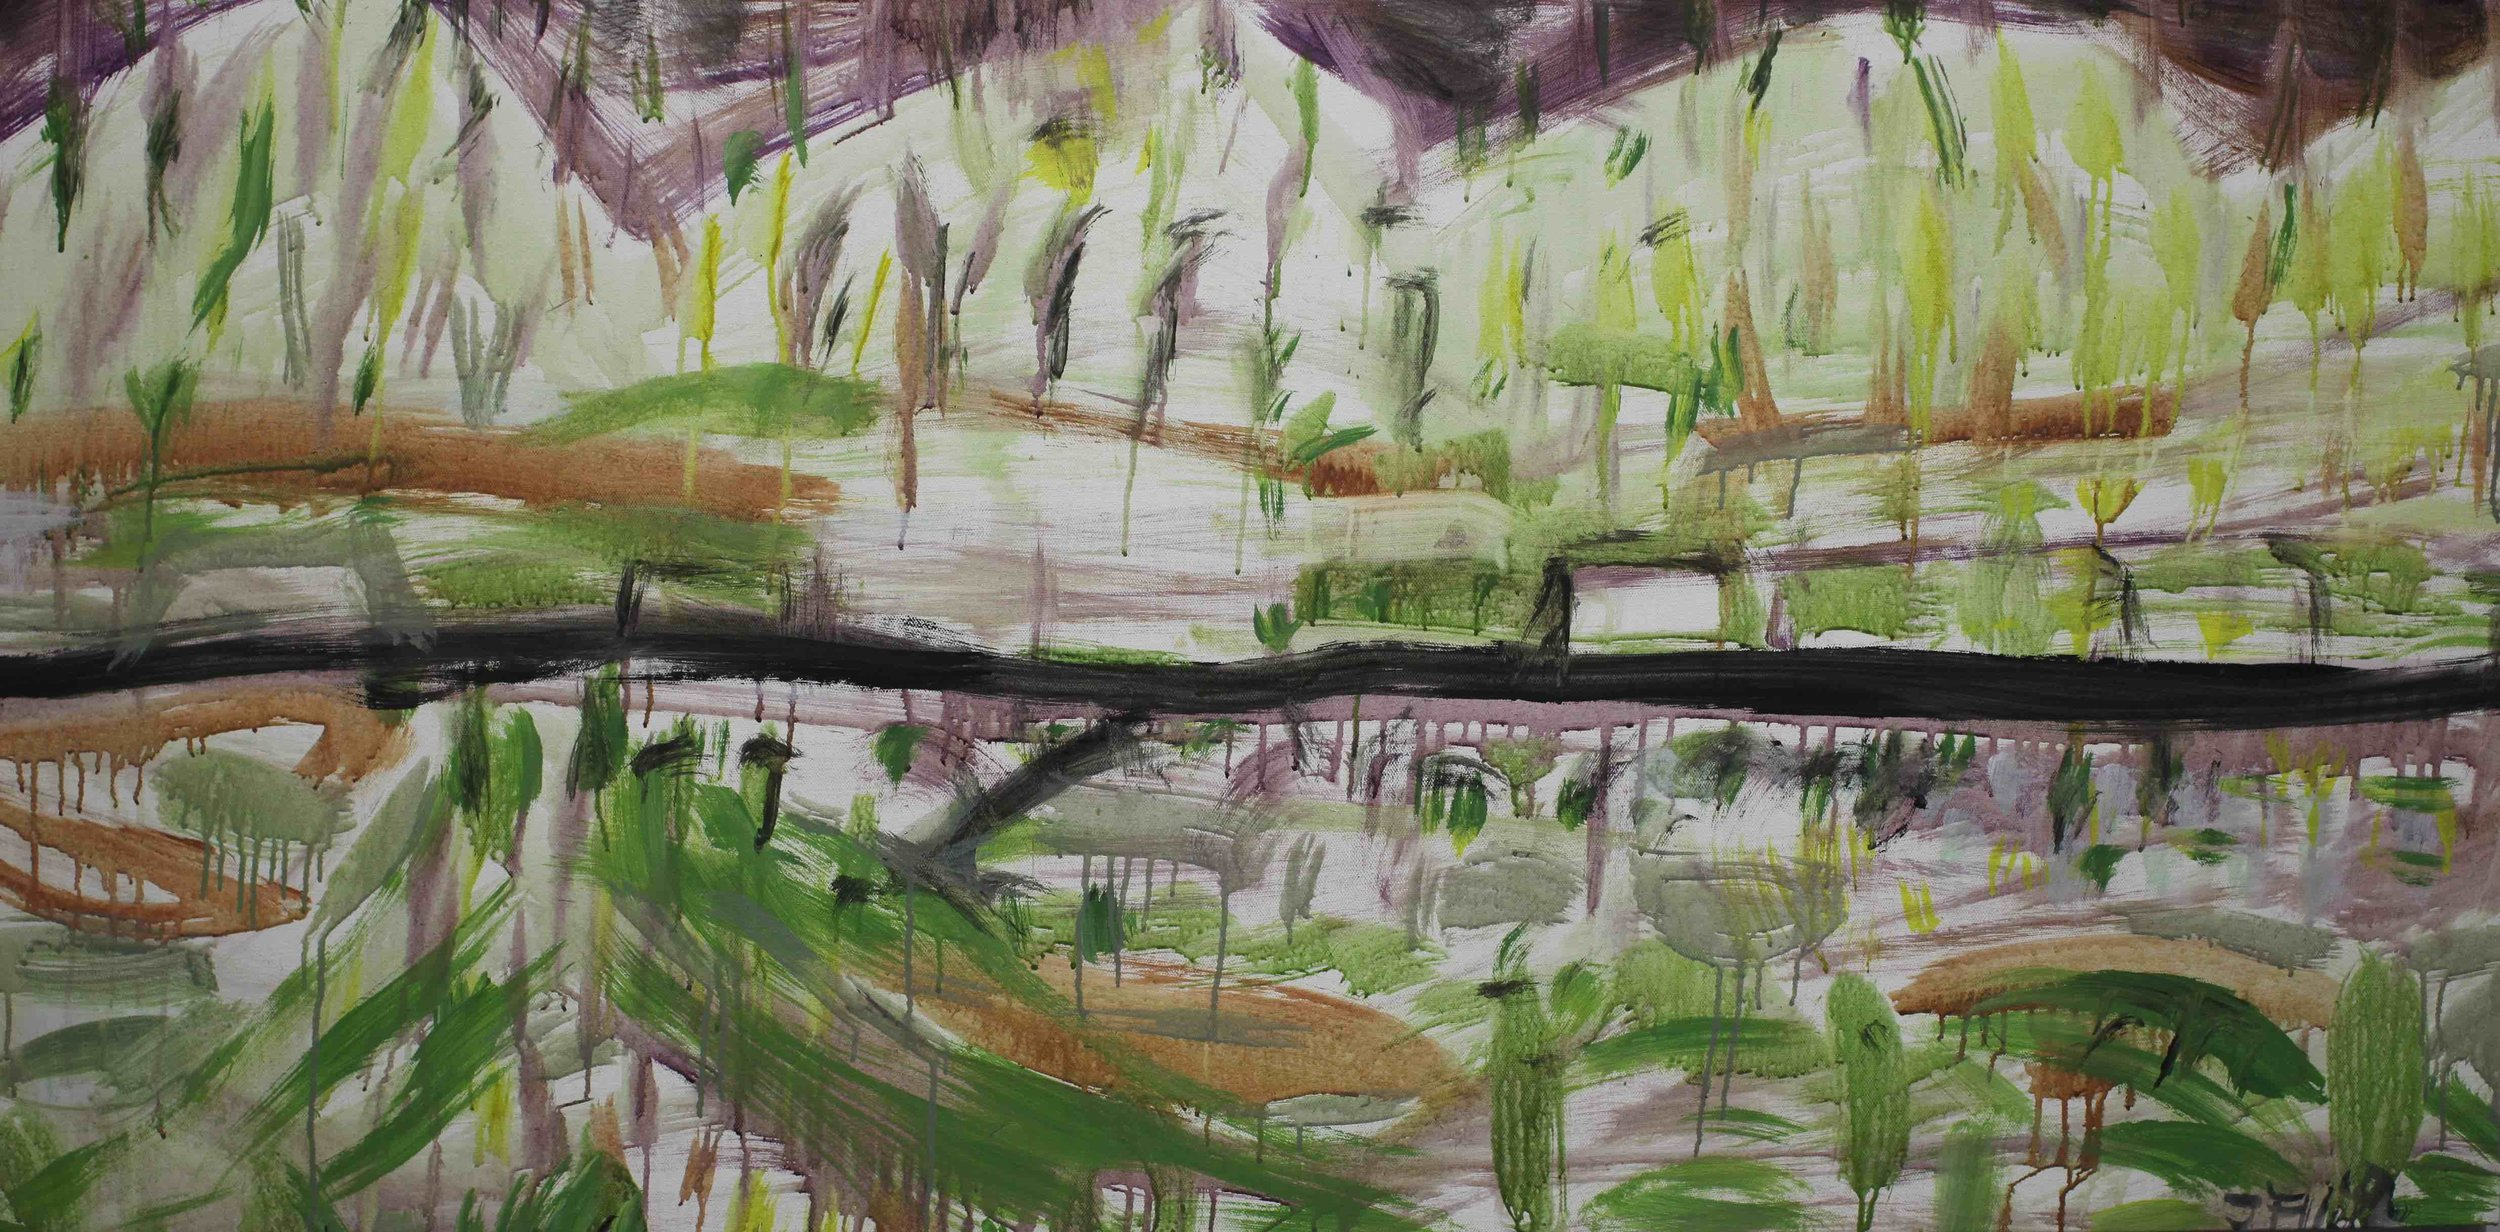 Joe Furlonger_The new Aspalt Road_2018_Acrylic on canvas_78x155.5cm_18,000AUD copy.jpg